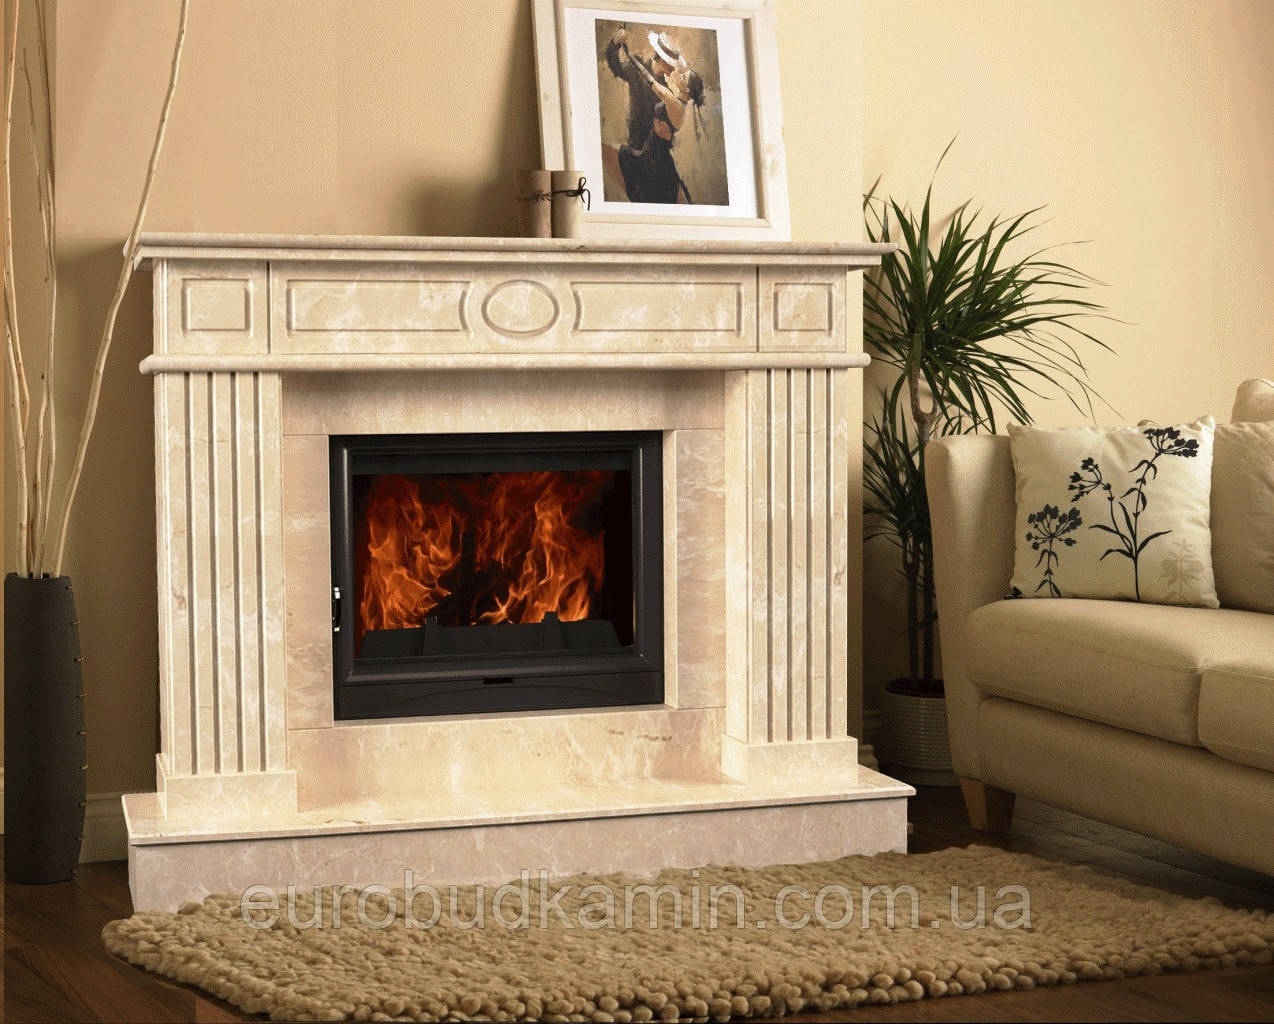 Портал для камина (облицовка) Оскар из натурального мрамора Bianco Carrara или Crema Marfil